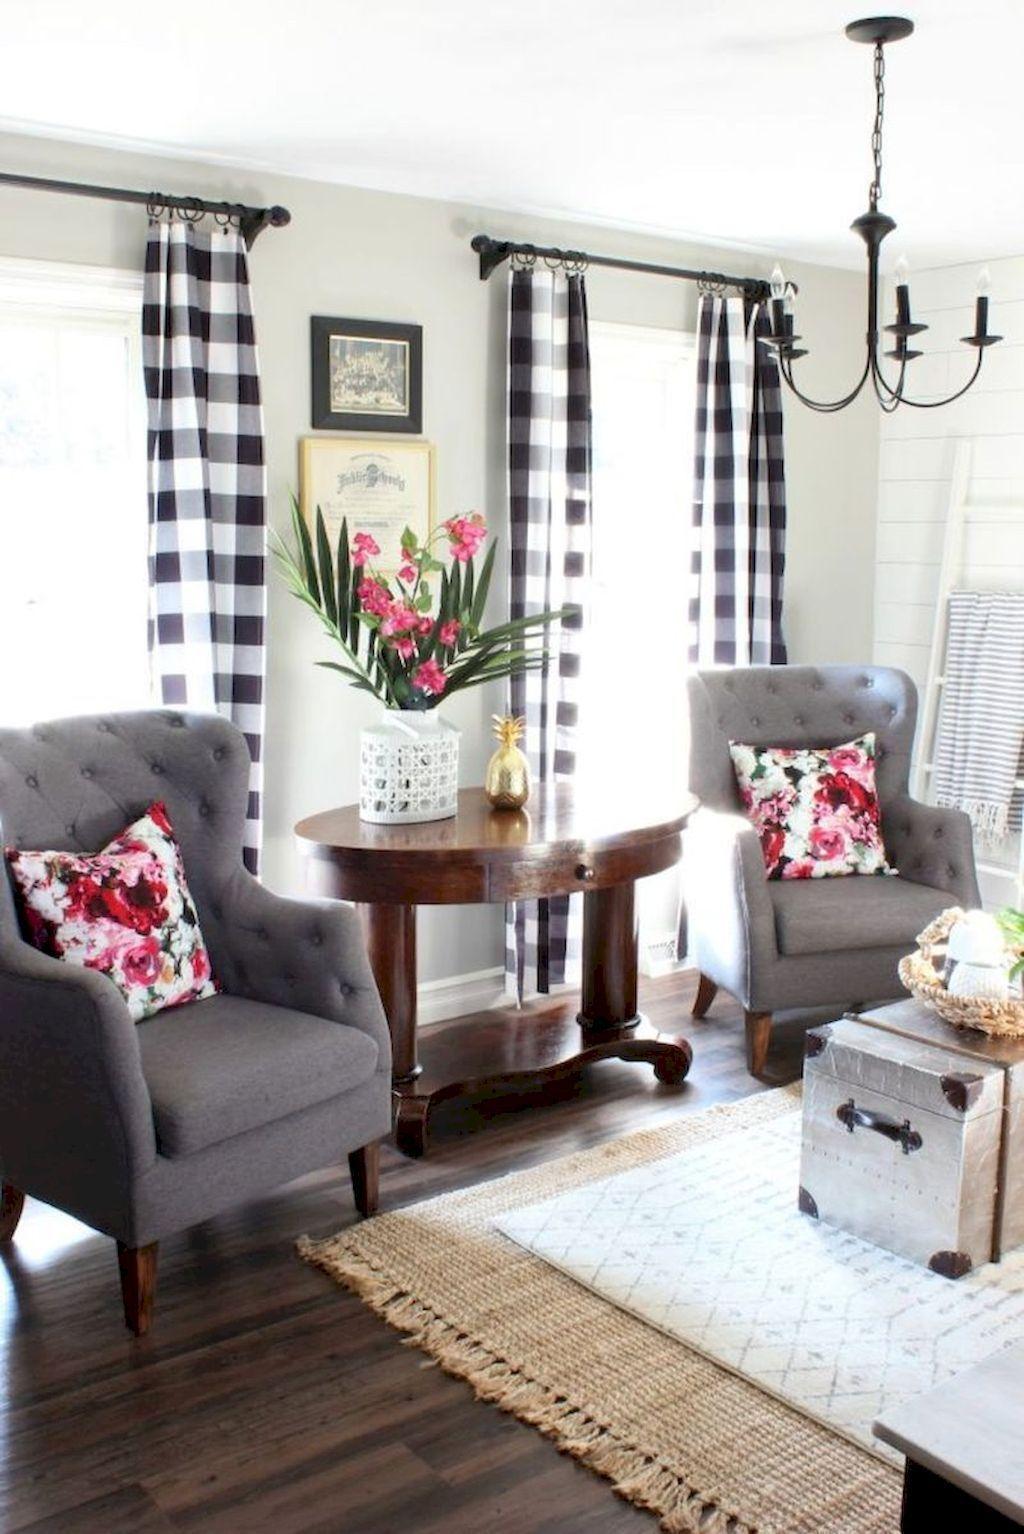 31 Cozy Modern Farmhouse Living Room Decor Ideas | home n decorating ...